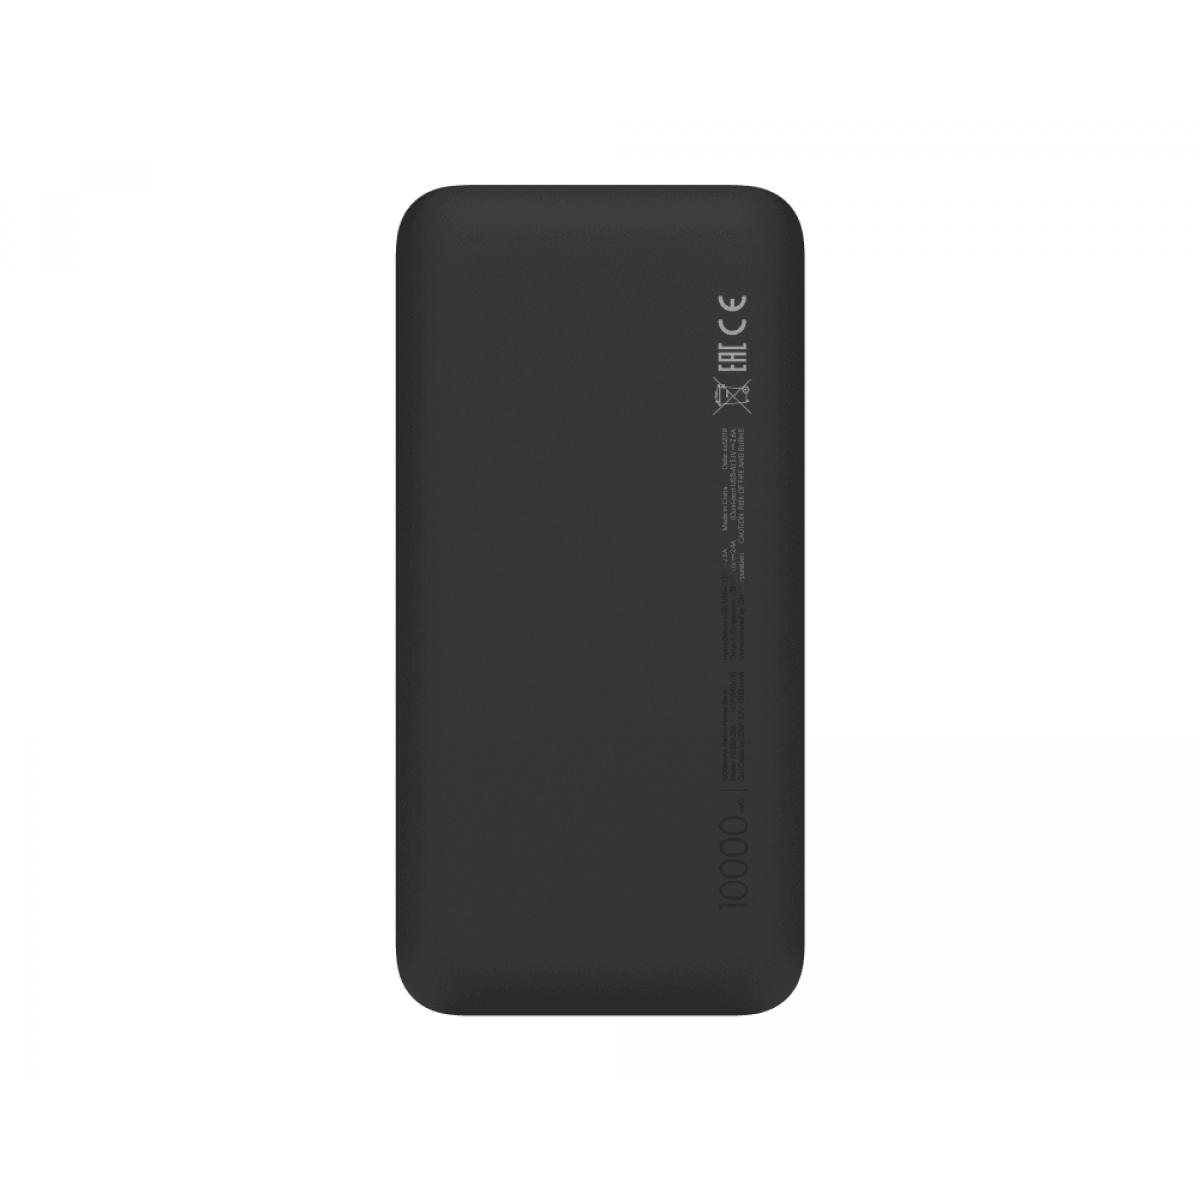 Аккумулятор внешний Xiaomi 10000mAh Redmi Power Bank (Black)